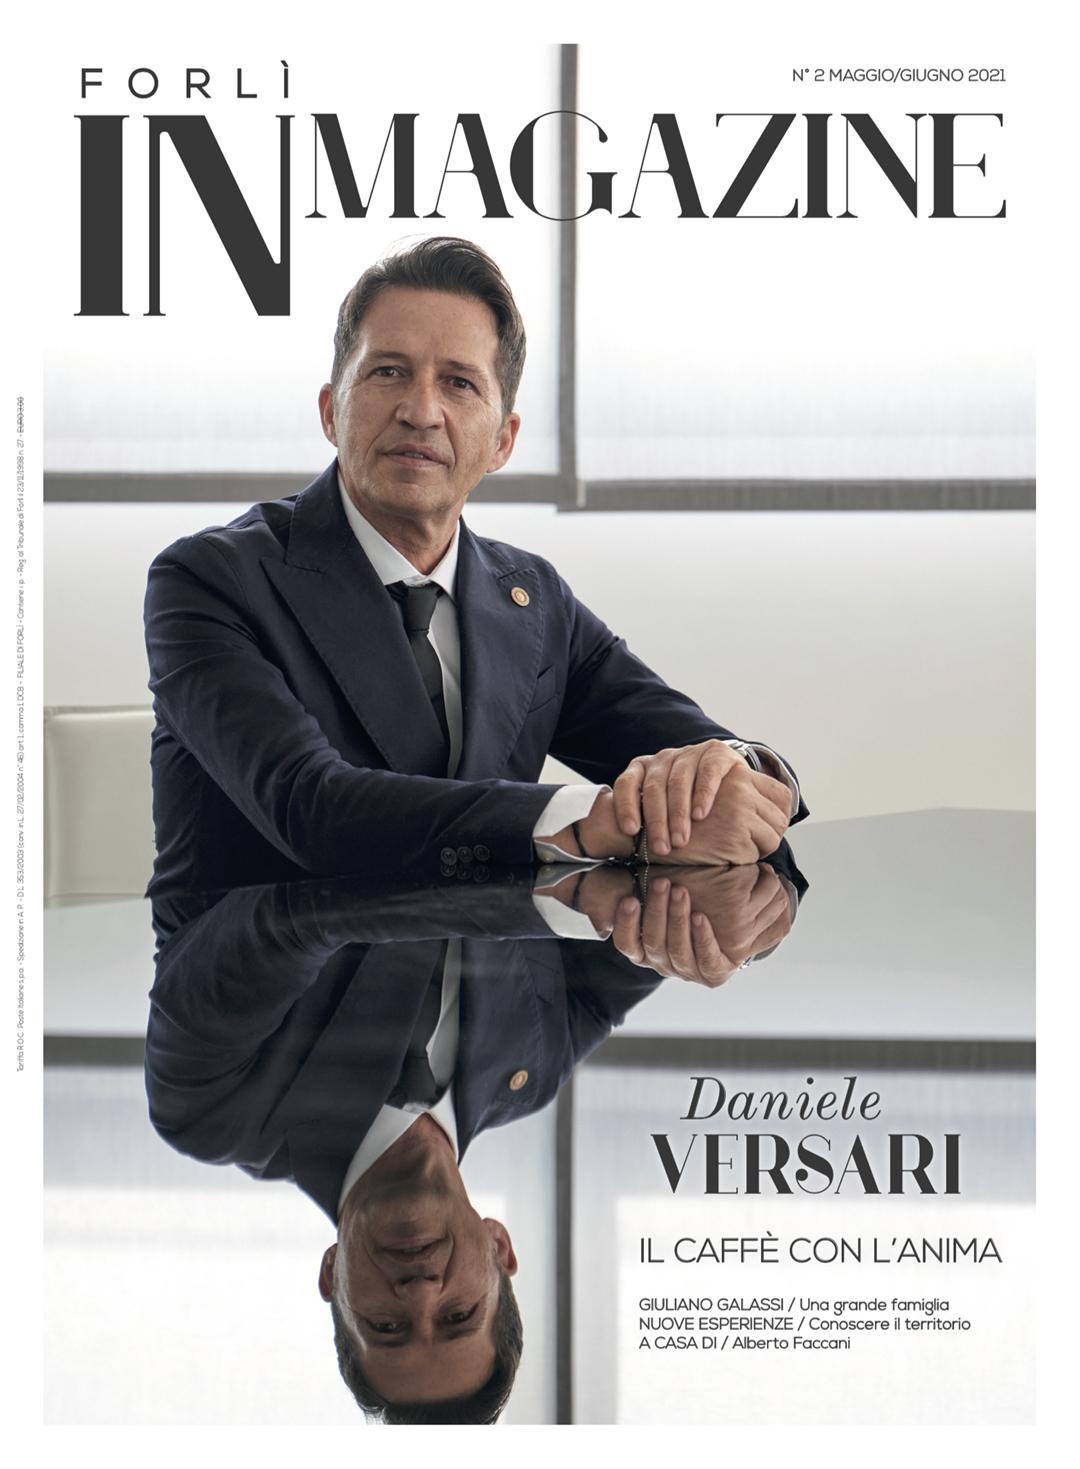 Daniele Versari copertina Forlì IN Magazine 2-2021